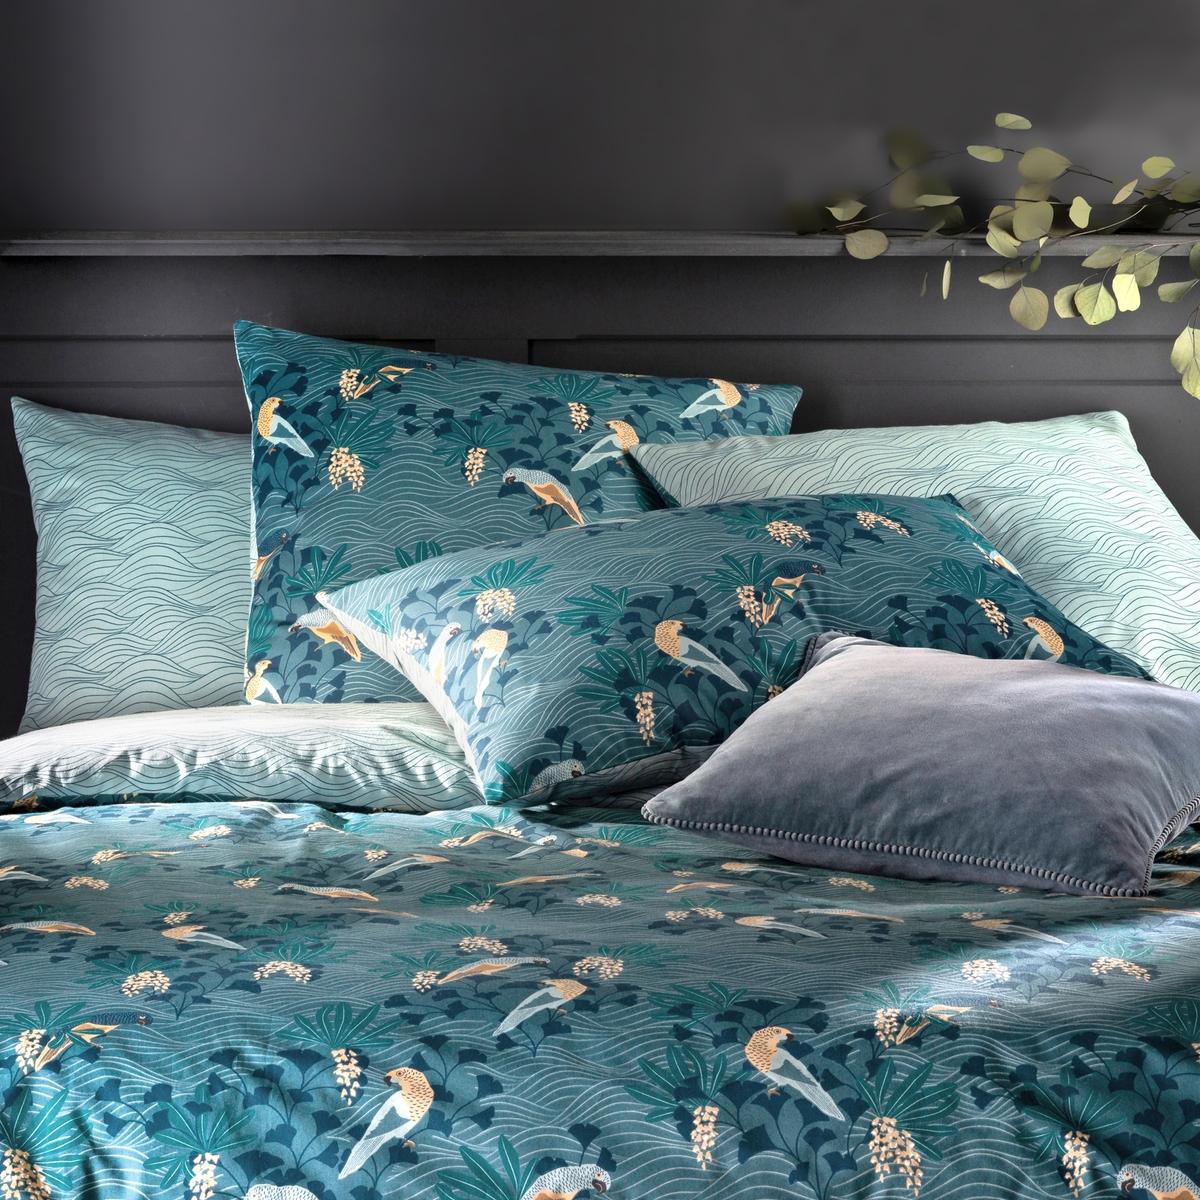 Minami Bird Print Pillowcase In Cotton Percale